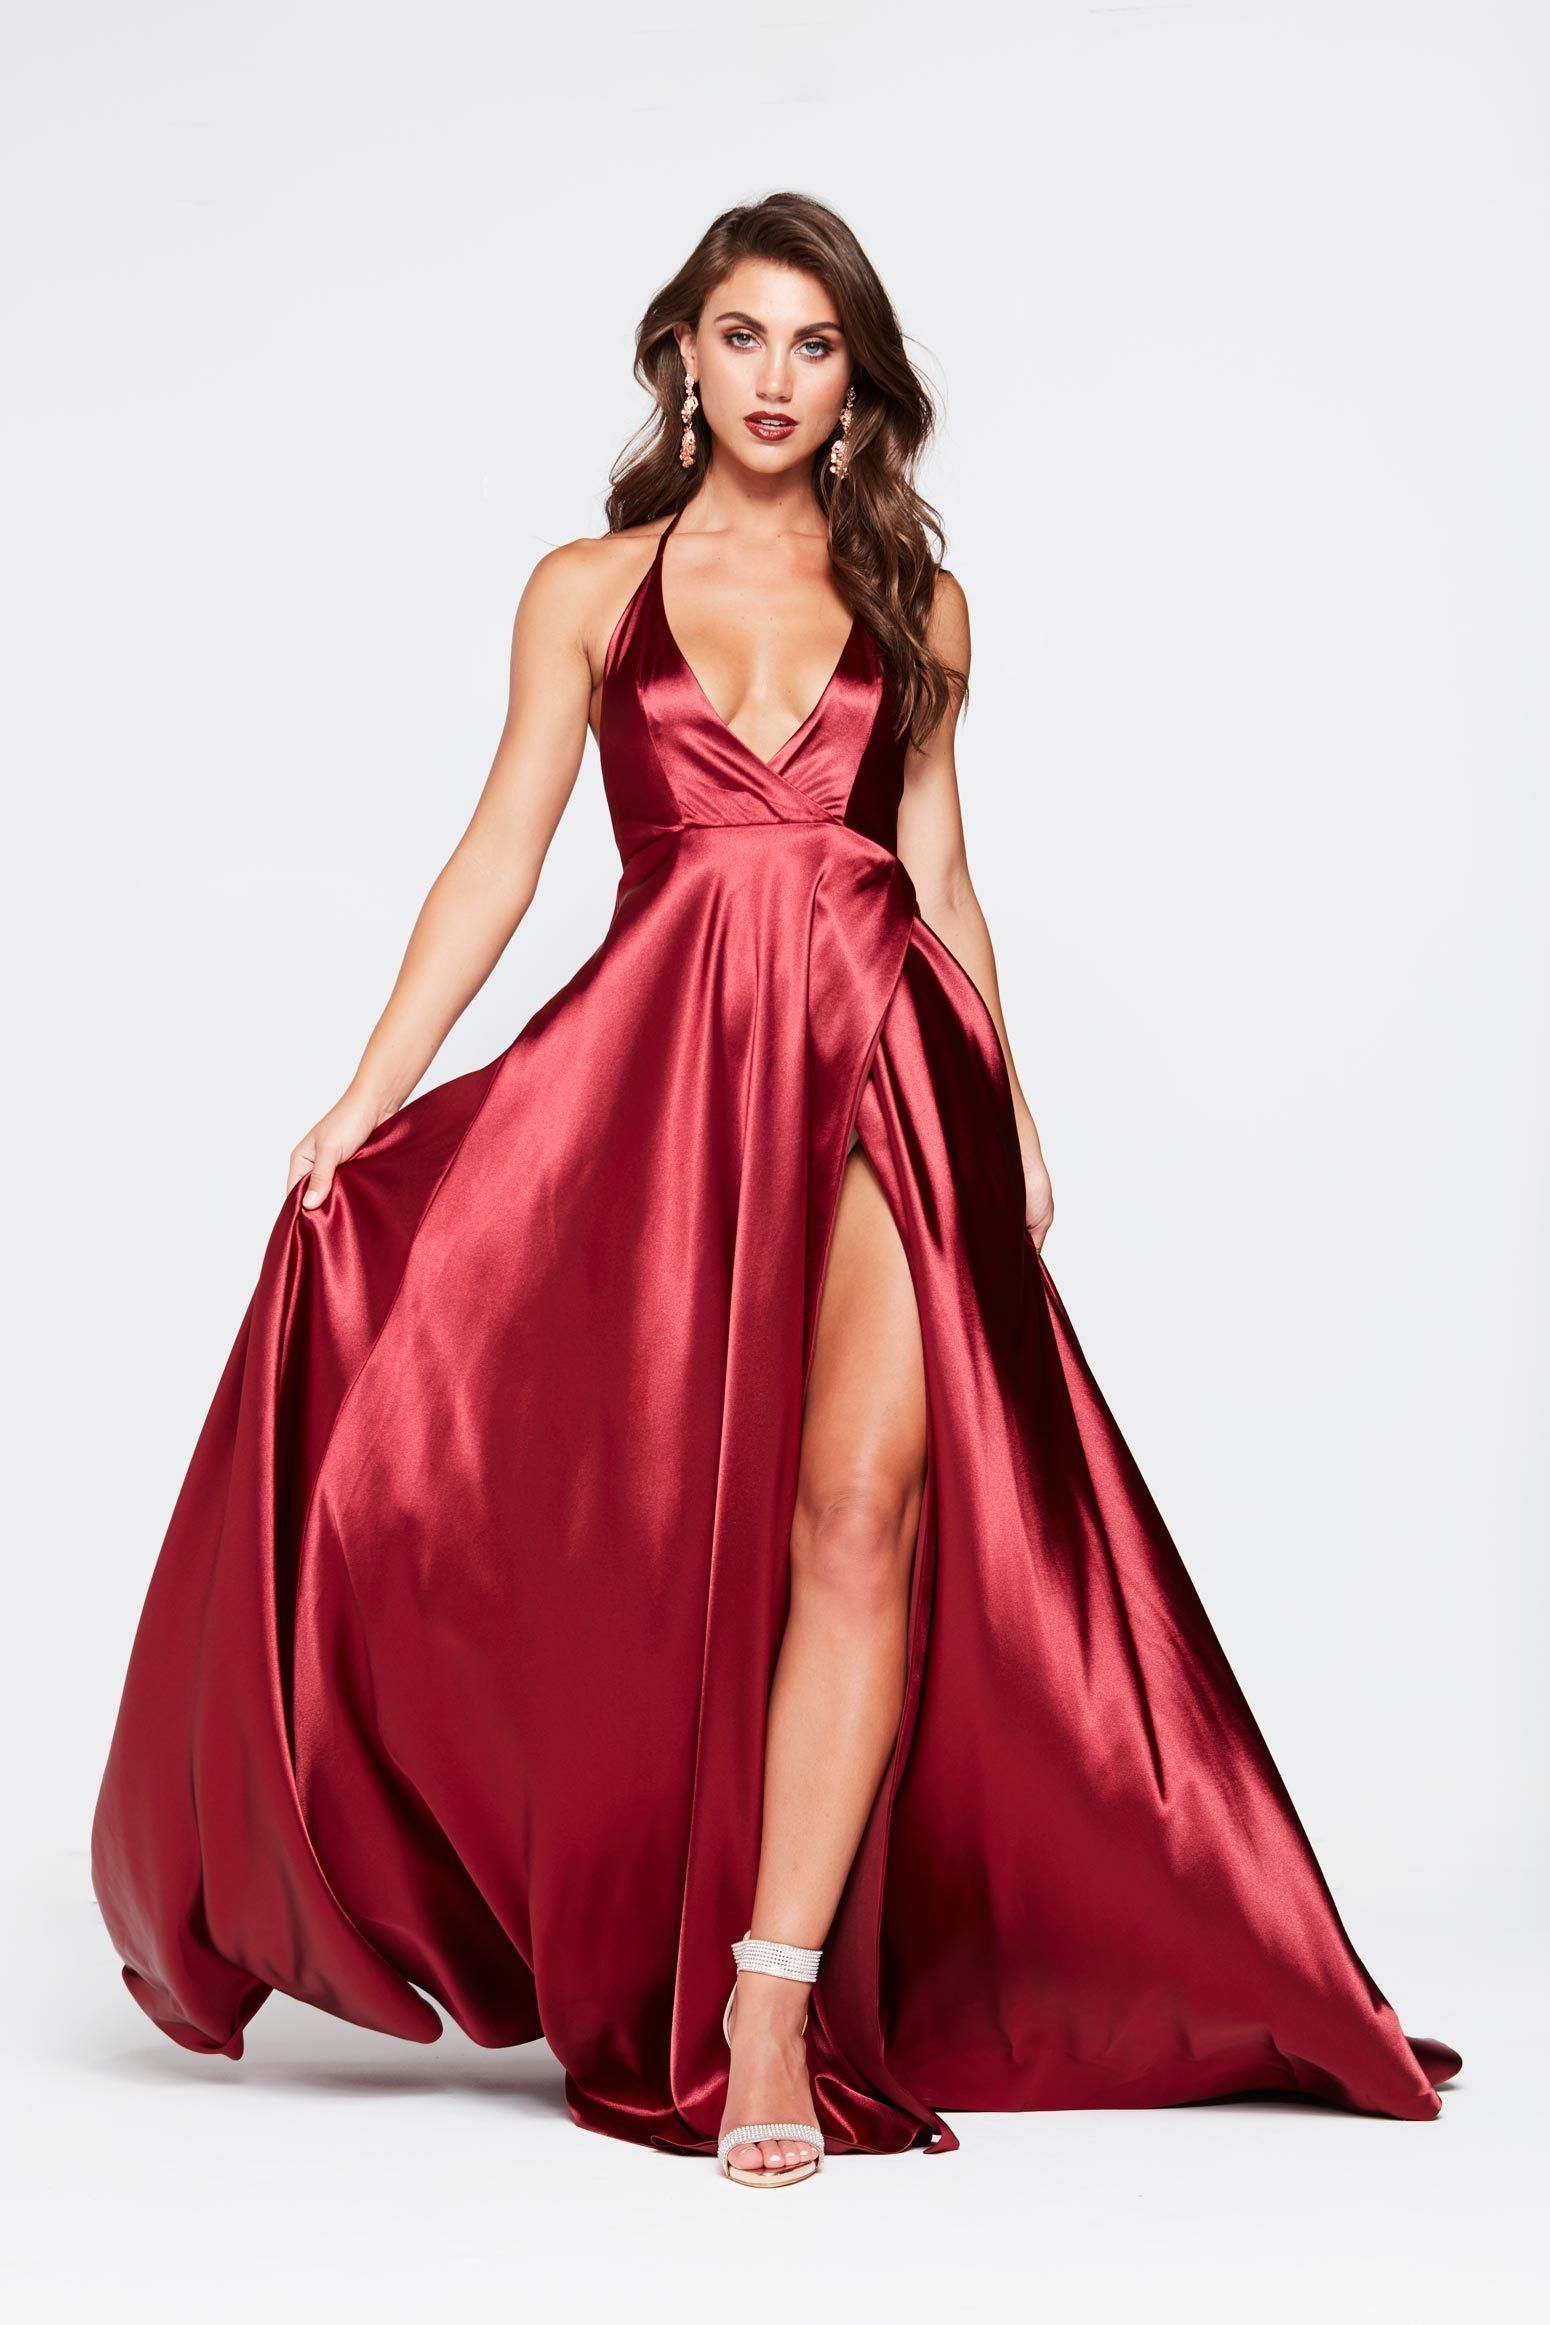 25+ Burgundy satin dress prom inspirations